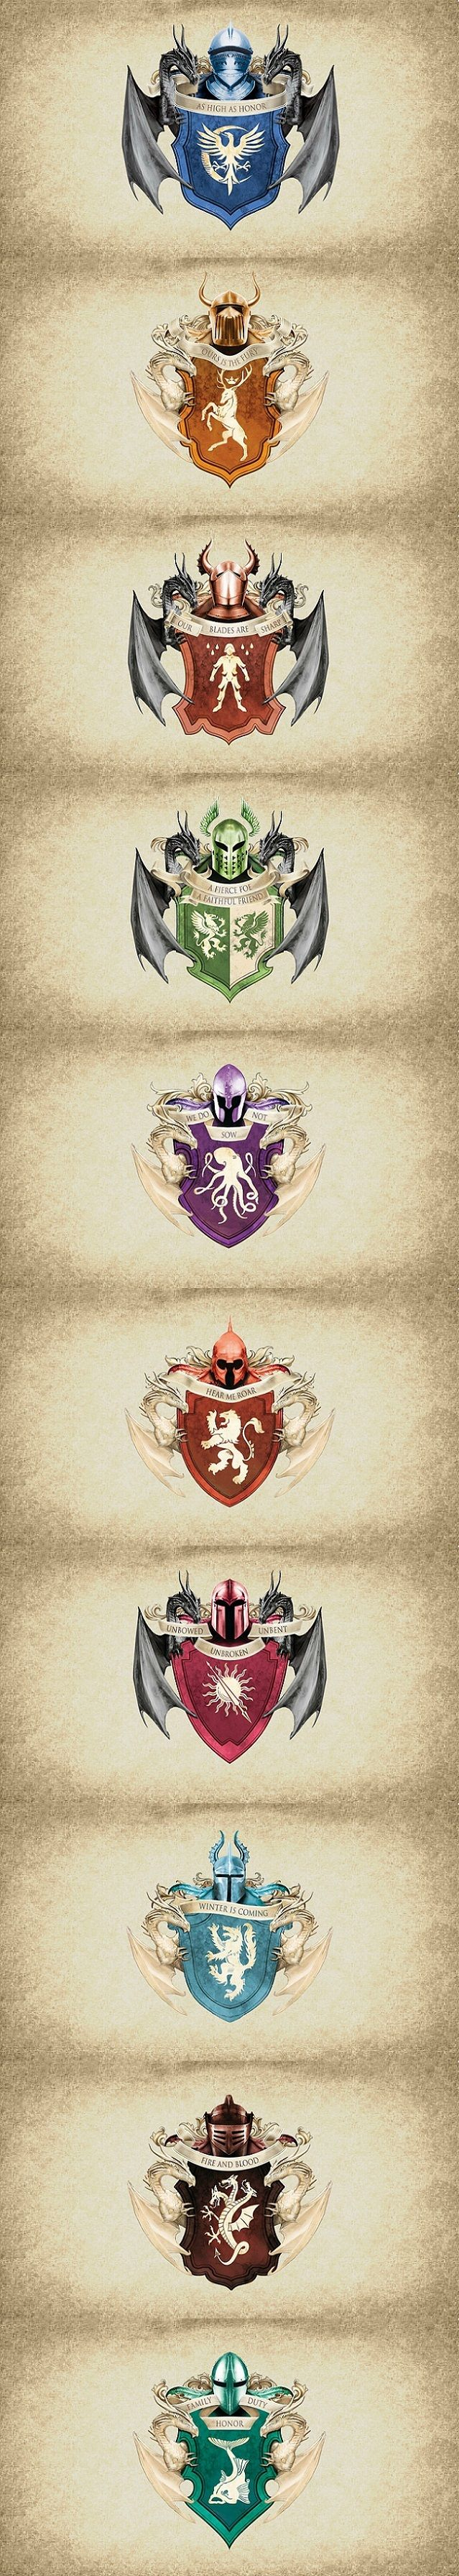 #GameOfThronesTamaño completo: http://i.imgur.com/LxHVuoh.jpg - @GUATO123456 - Game Of Thrones